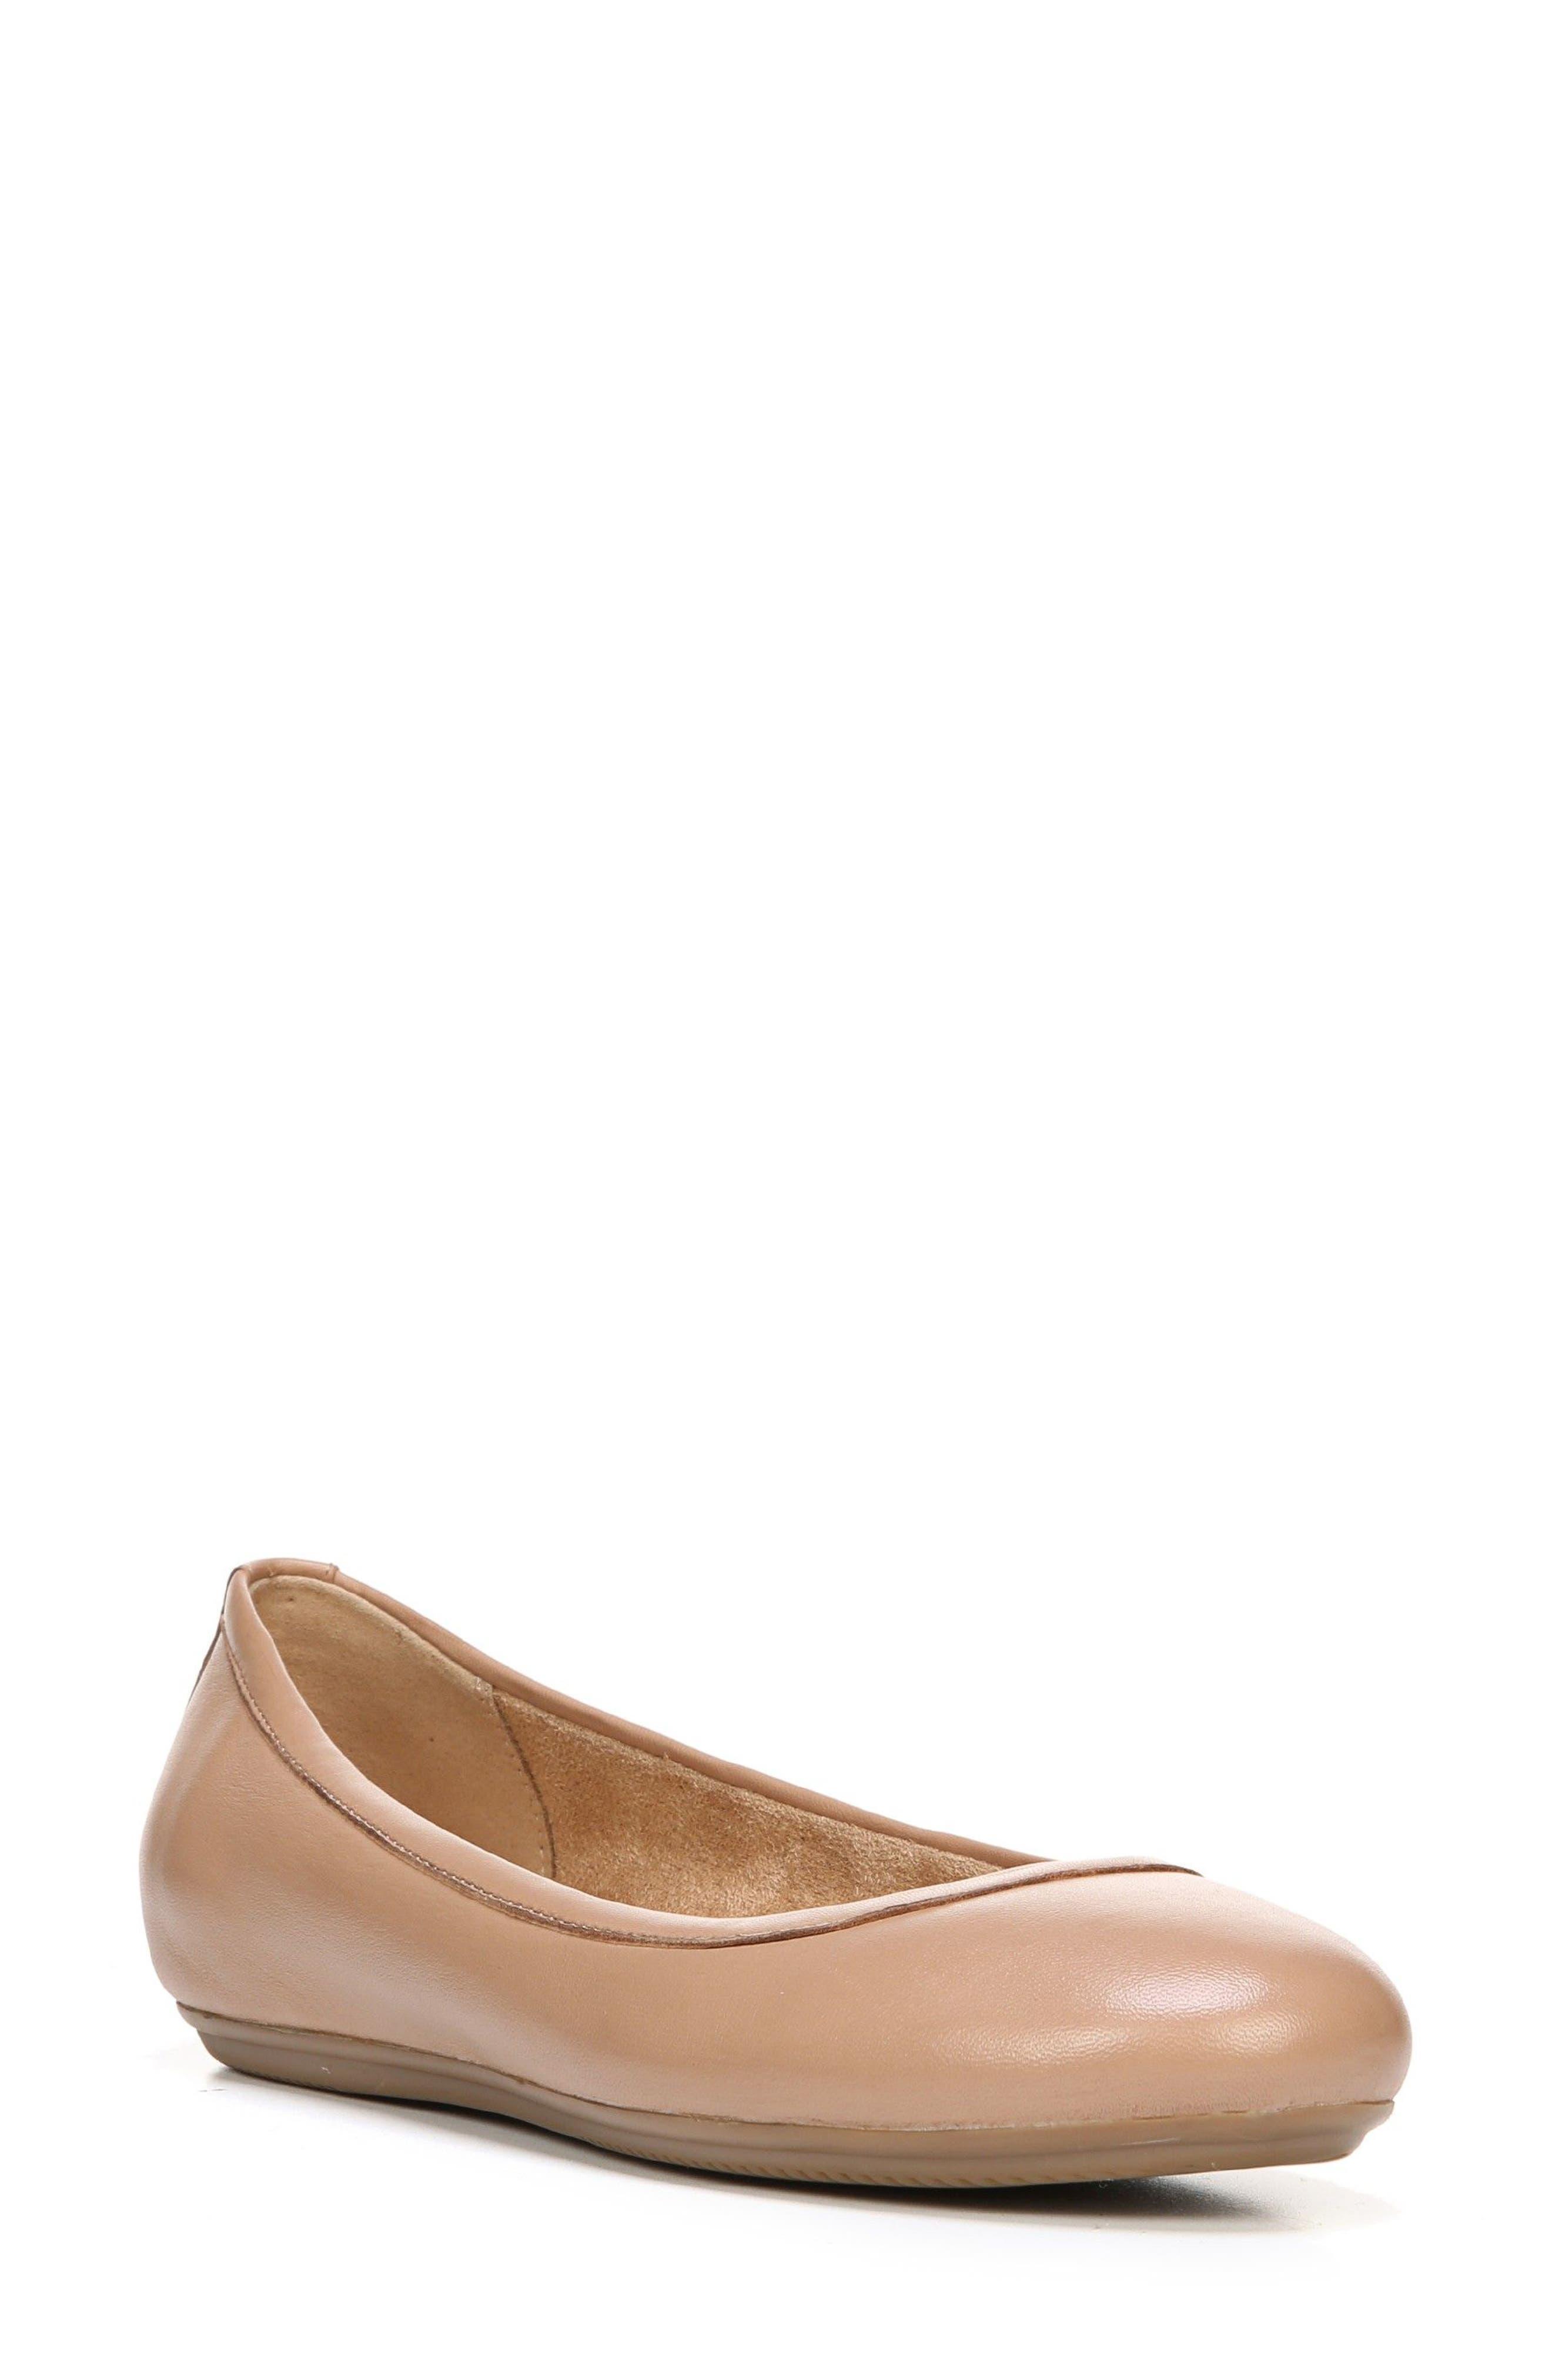 Brittany Ballet Flat,                             Main thumbnail 8, color,